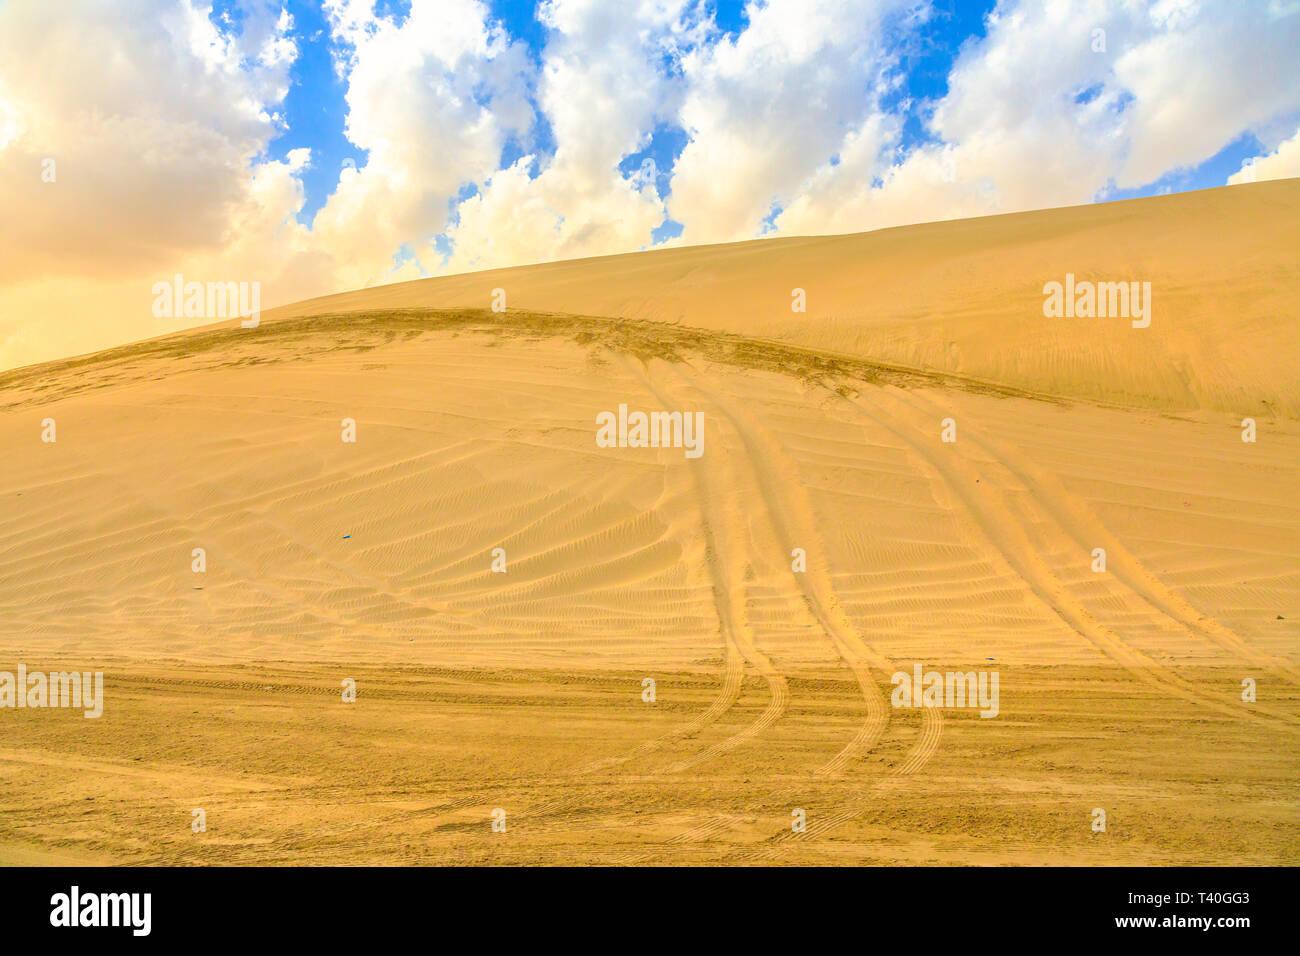 Desert safari adventure at Khor Al Udeid, Persian Gulf, Middle East. Desert landscape sand dunes near Qatar and Saudi Arabia. Inland sea is a major to - Stock Image